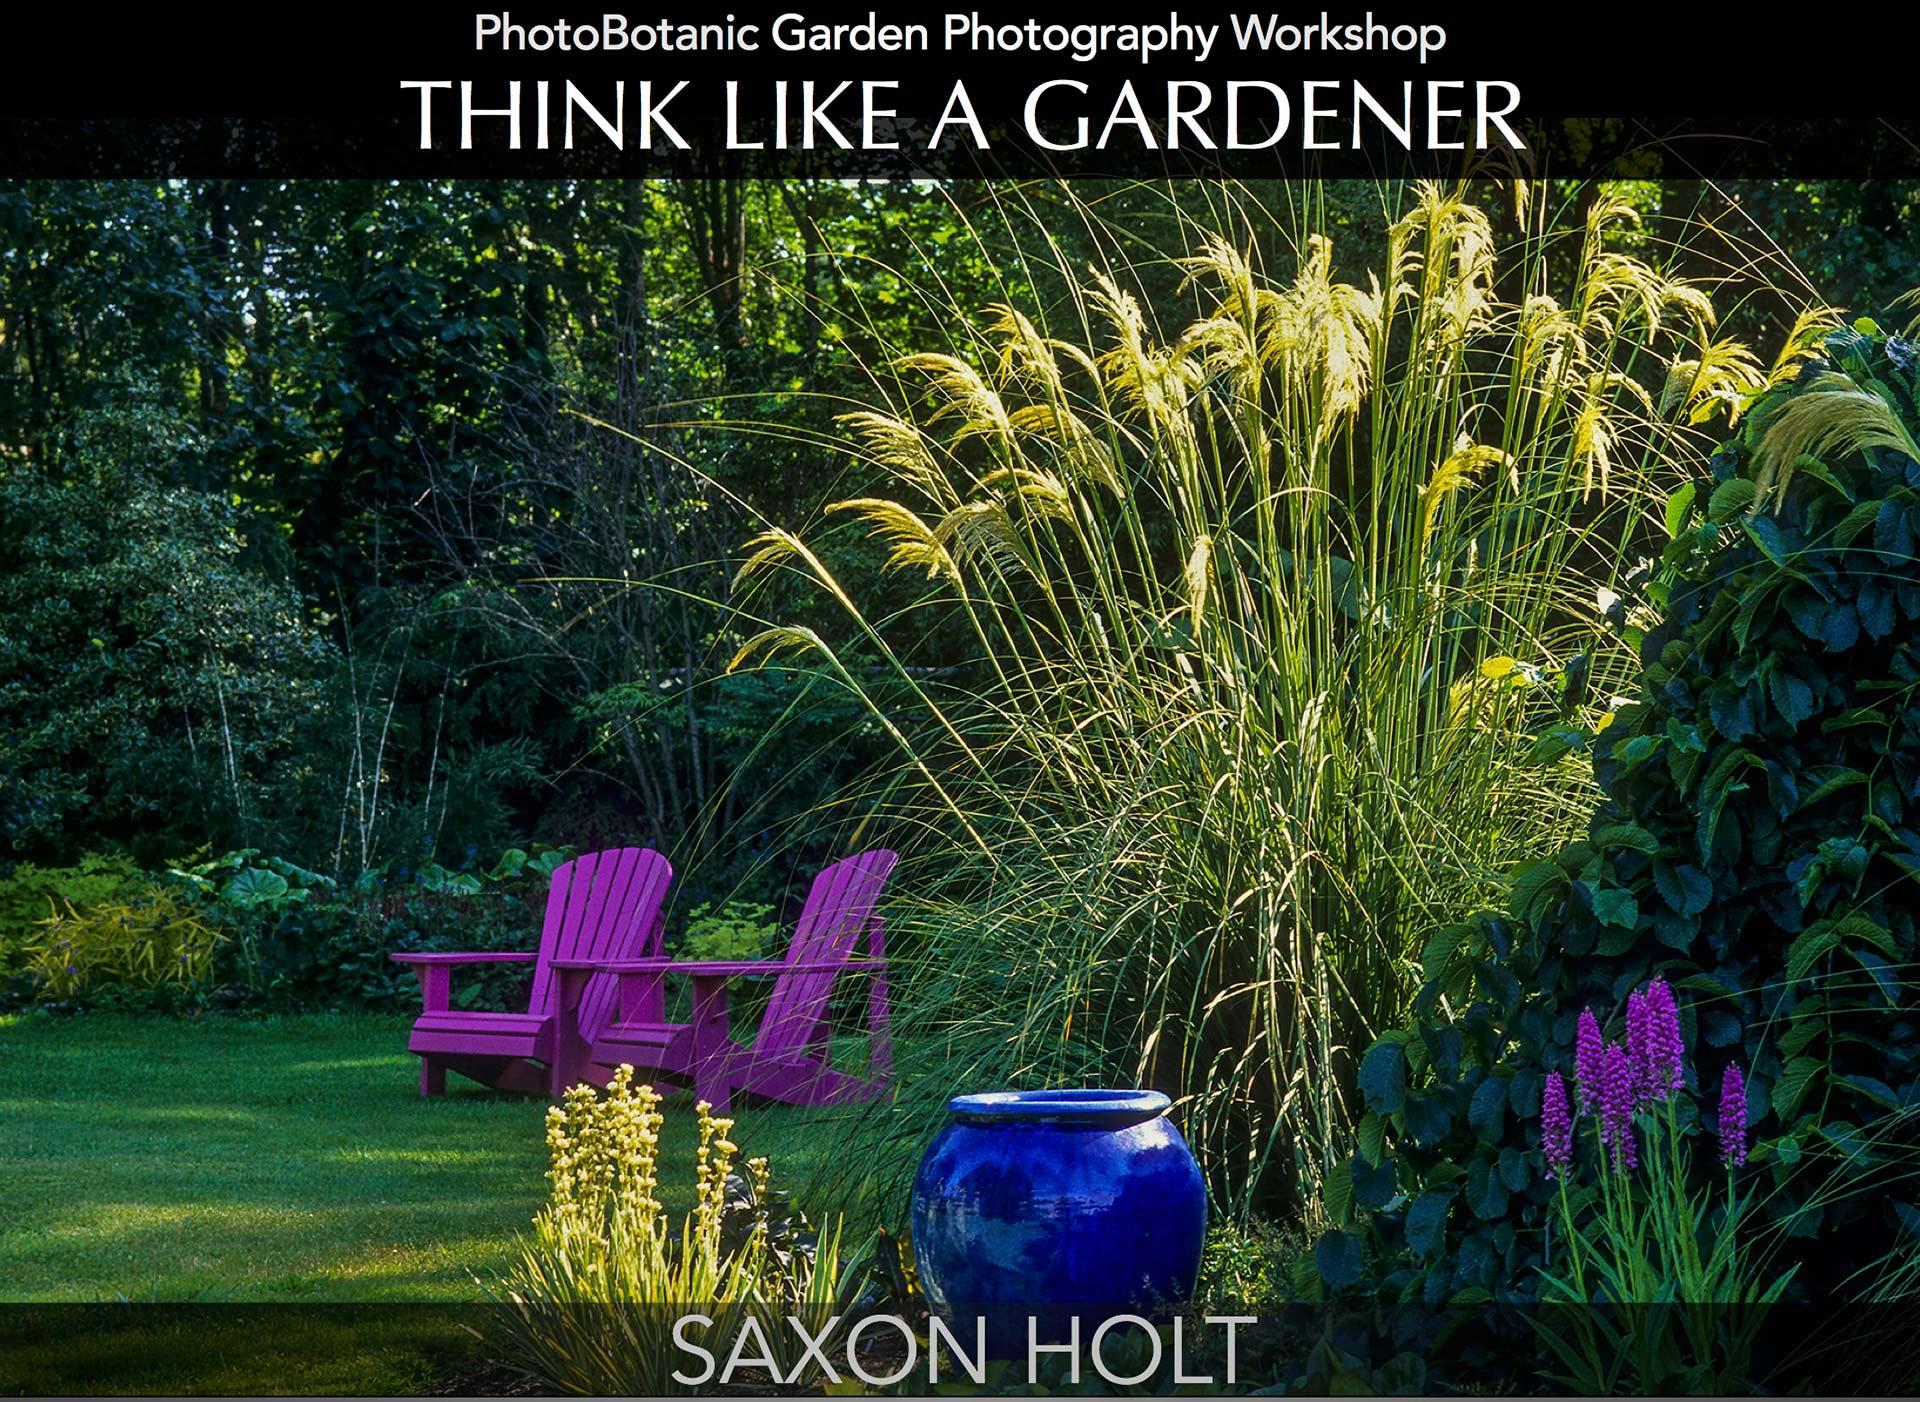 PhotoBotanic Garden Photography Workbook, Think Lke A Gardner eBook Cover